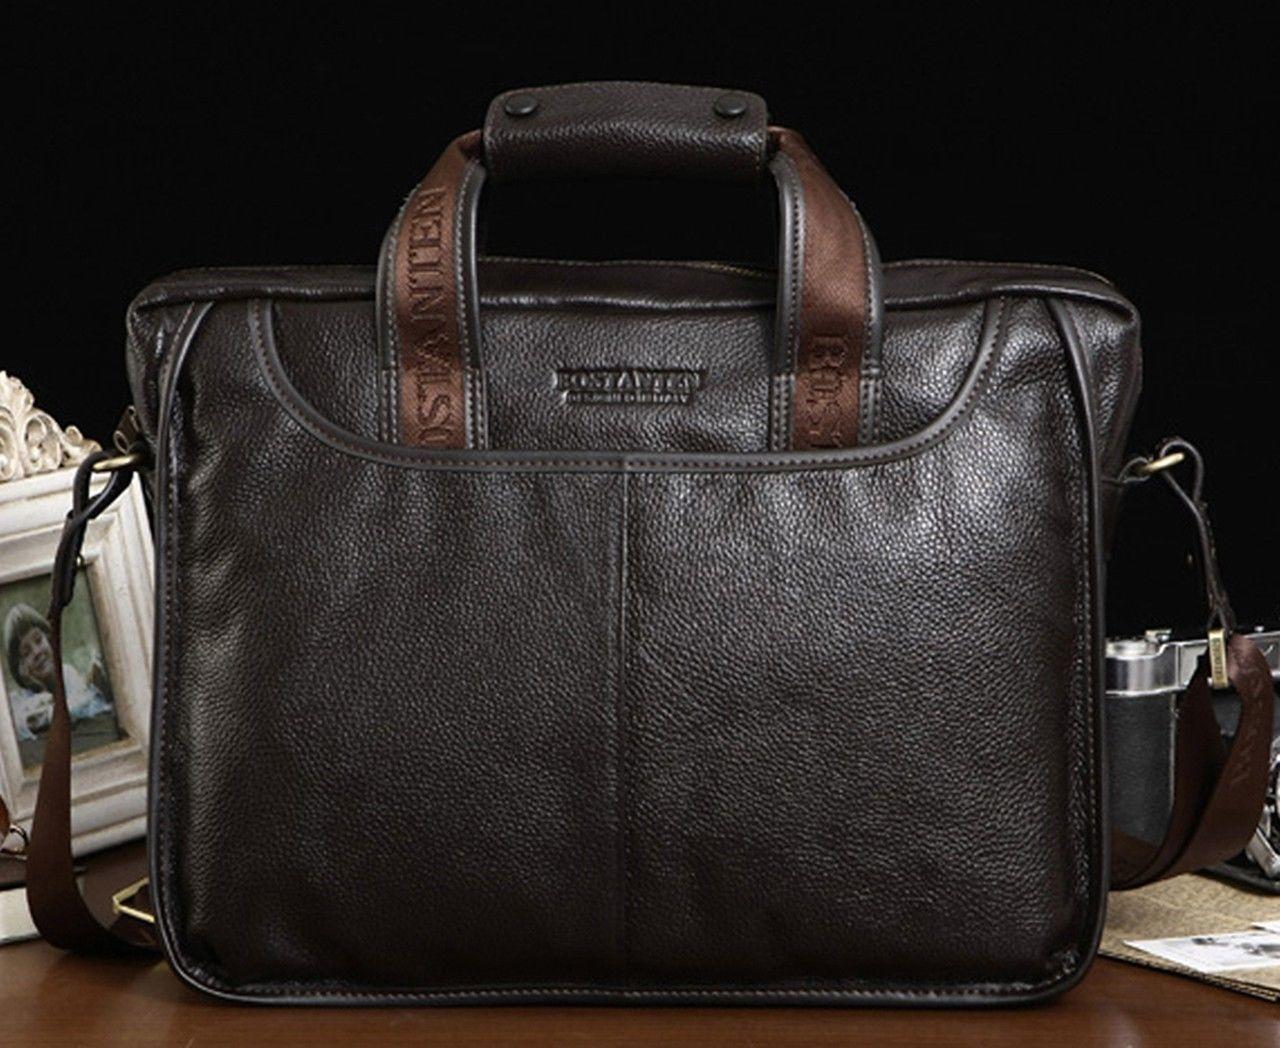 New Men's Real Leather Briefcase Handbag Tote Attache Cases